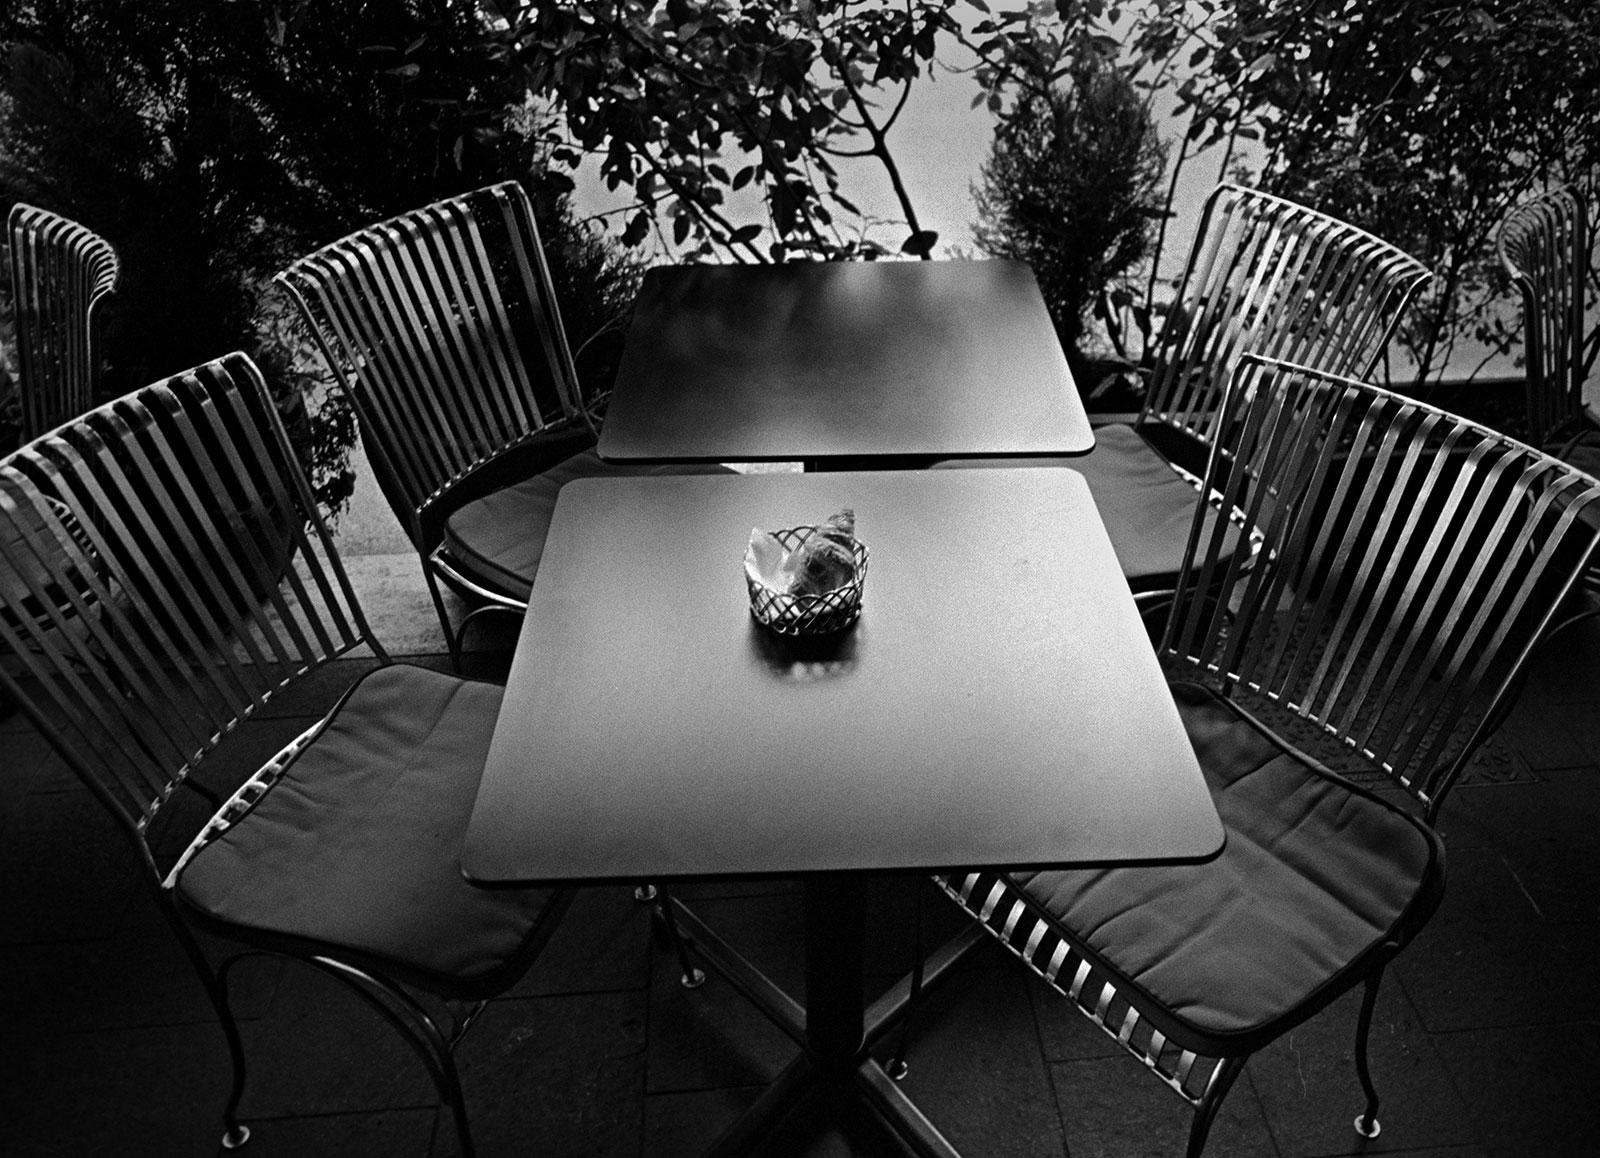 Croissant awaits coffee